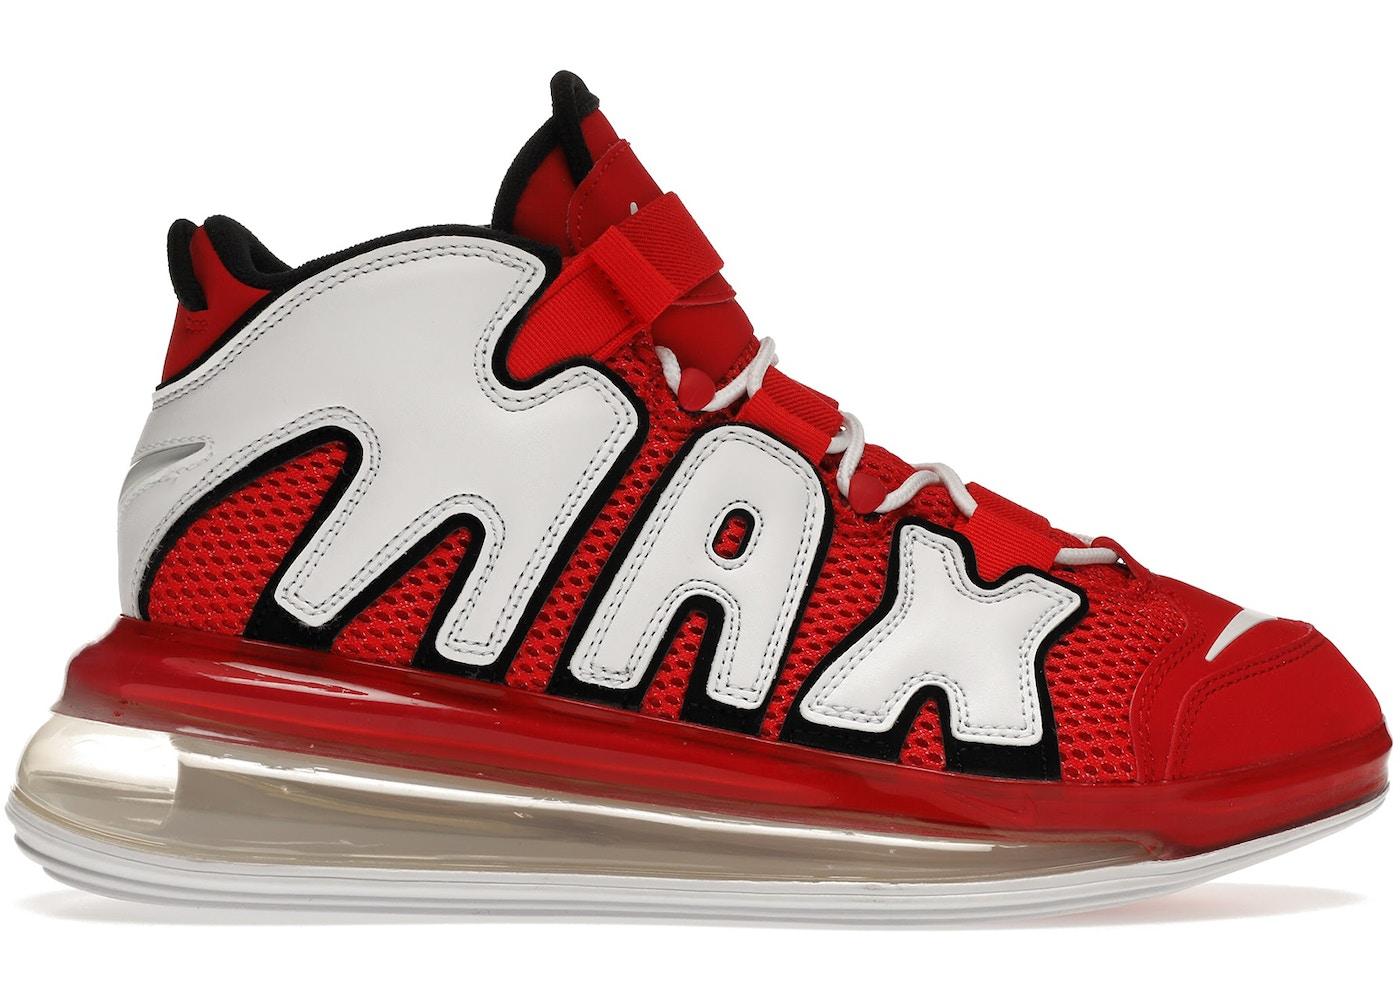 obtener Goma Debilitar  Nike Air More Uptempo 720 University Red White Black - CJ3662-600